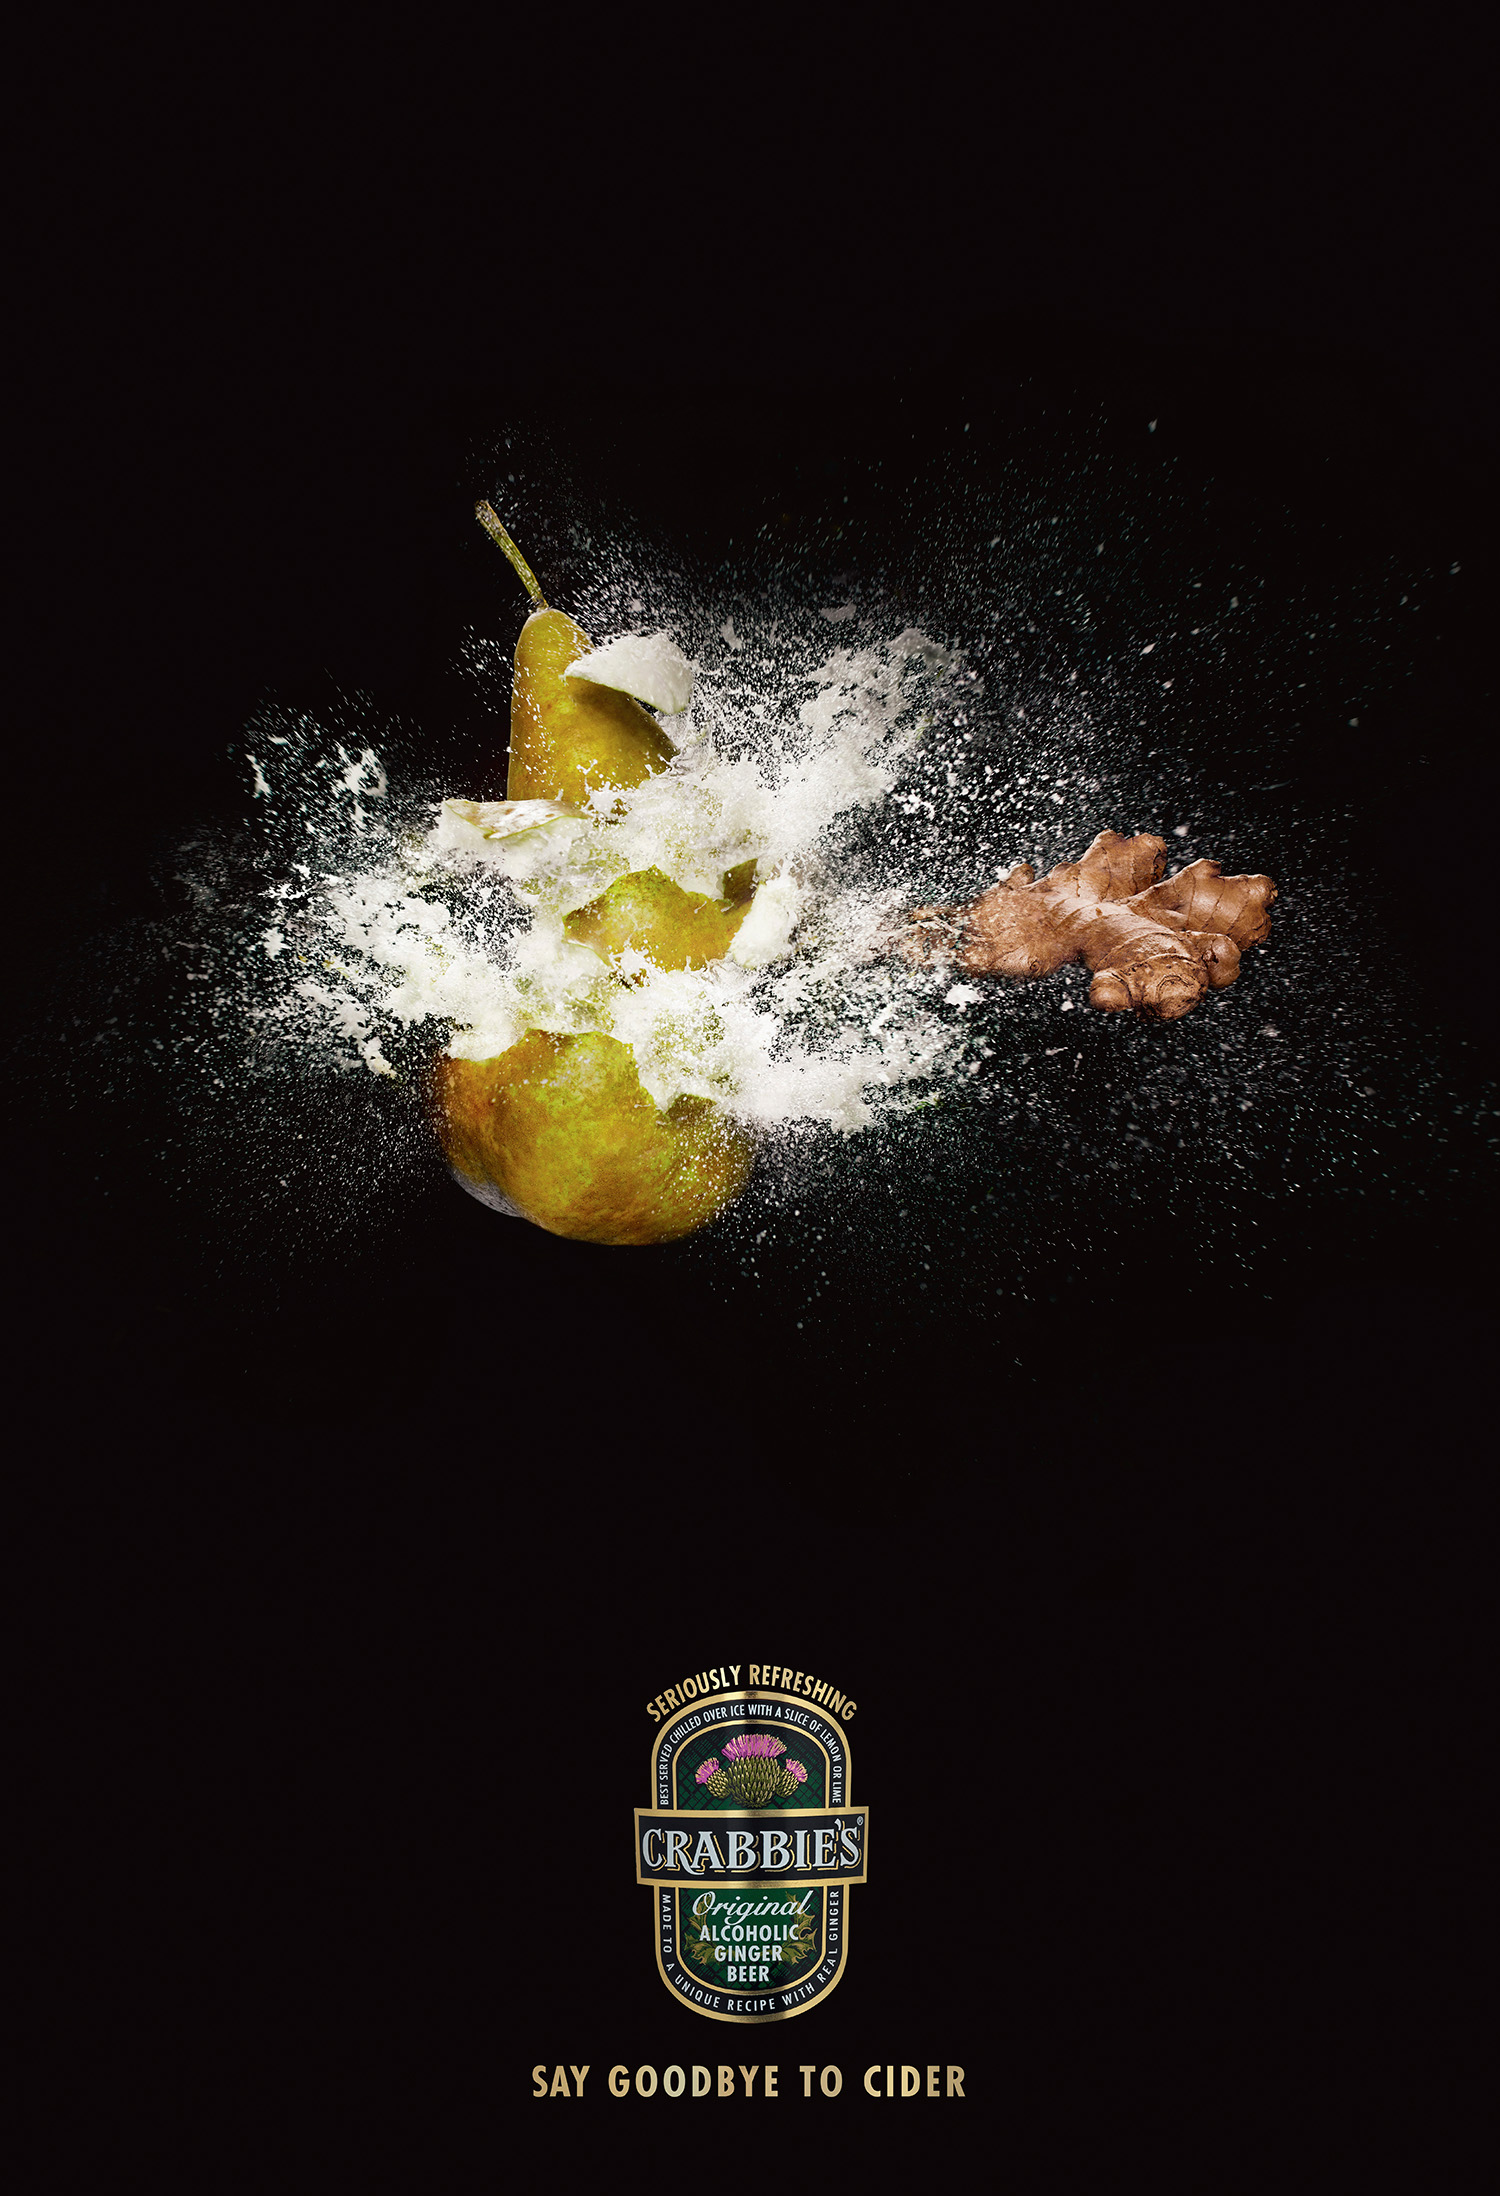 Crabbie's Ginger Beer  Agency:Droga 5  Art Director: Cam Blackley  Retouching: Toby & Pete